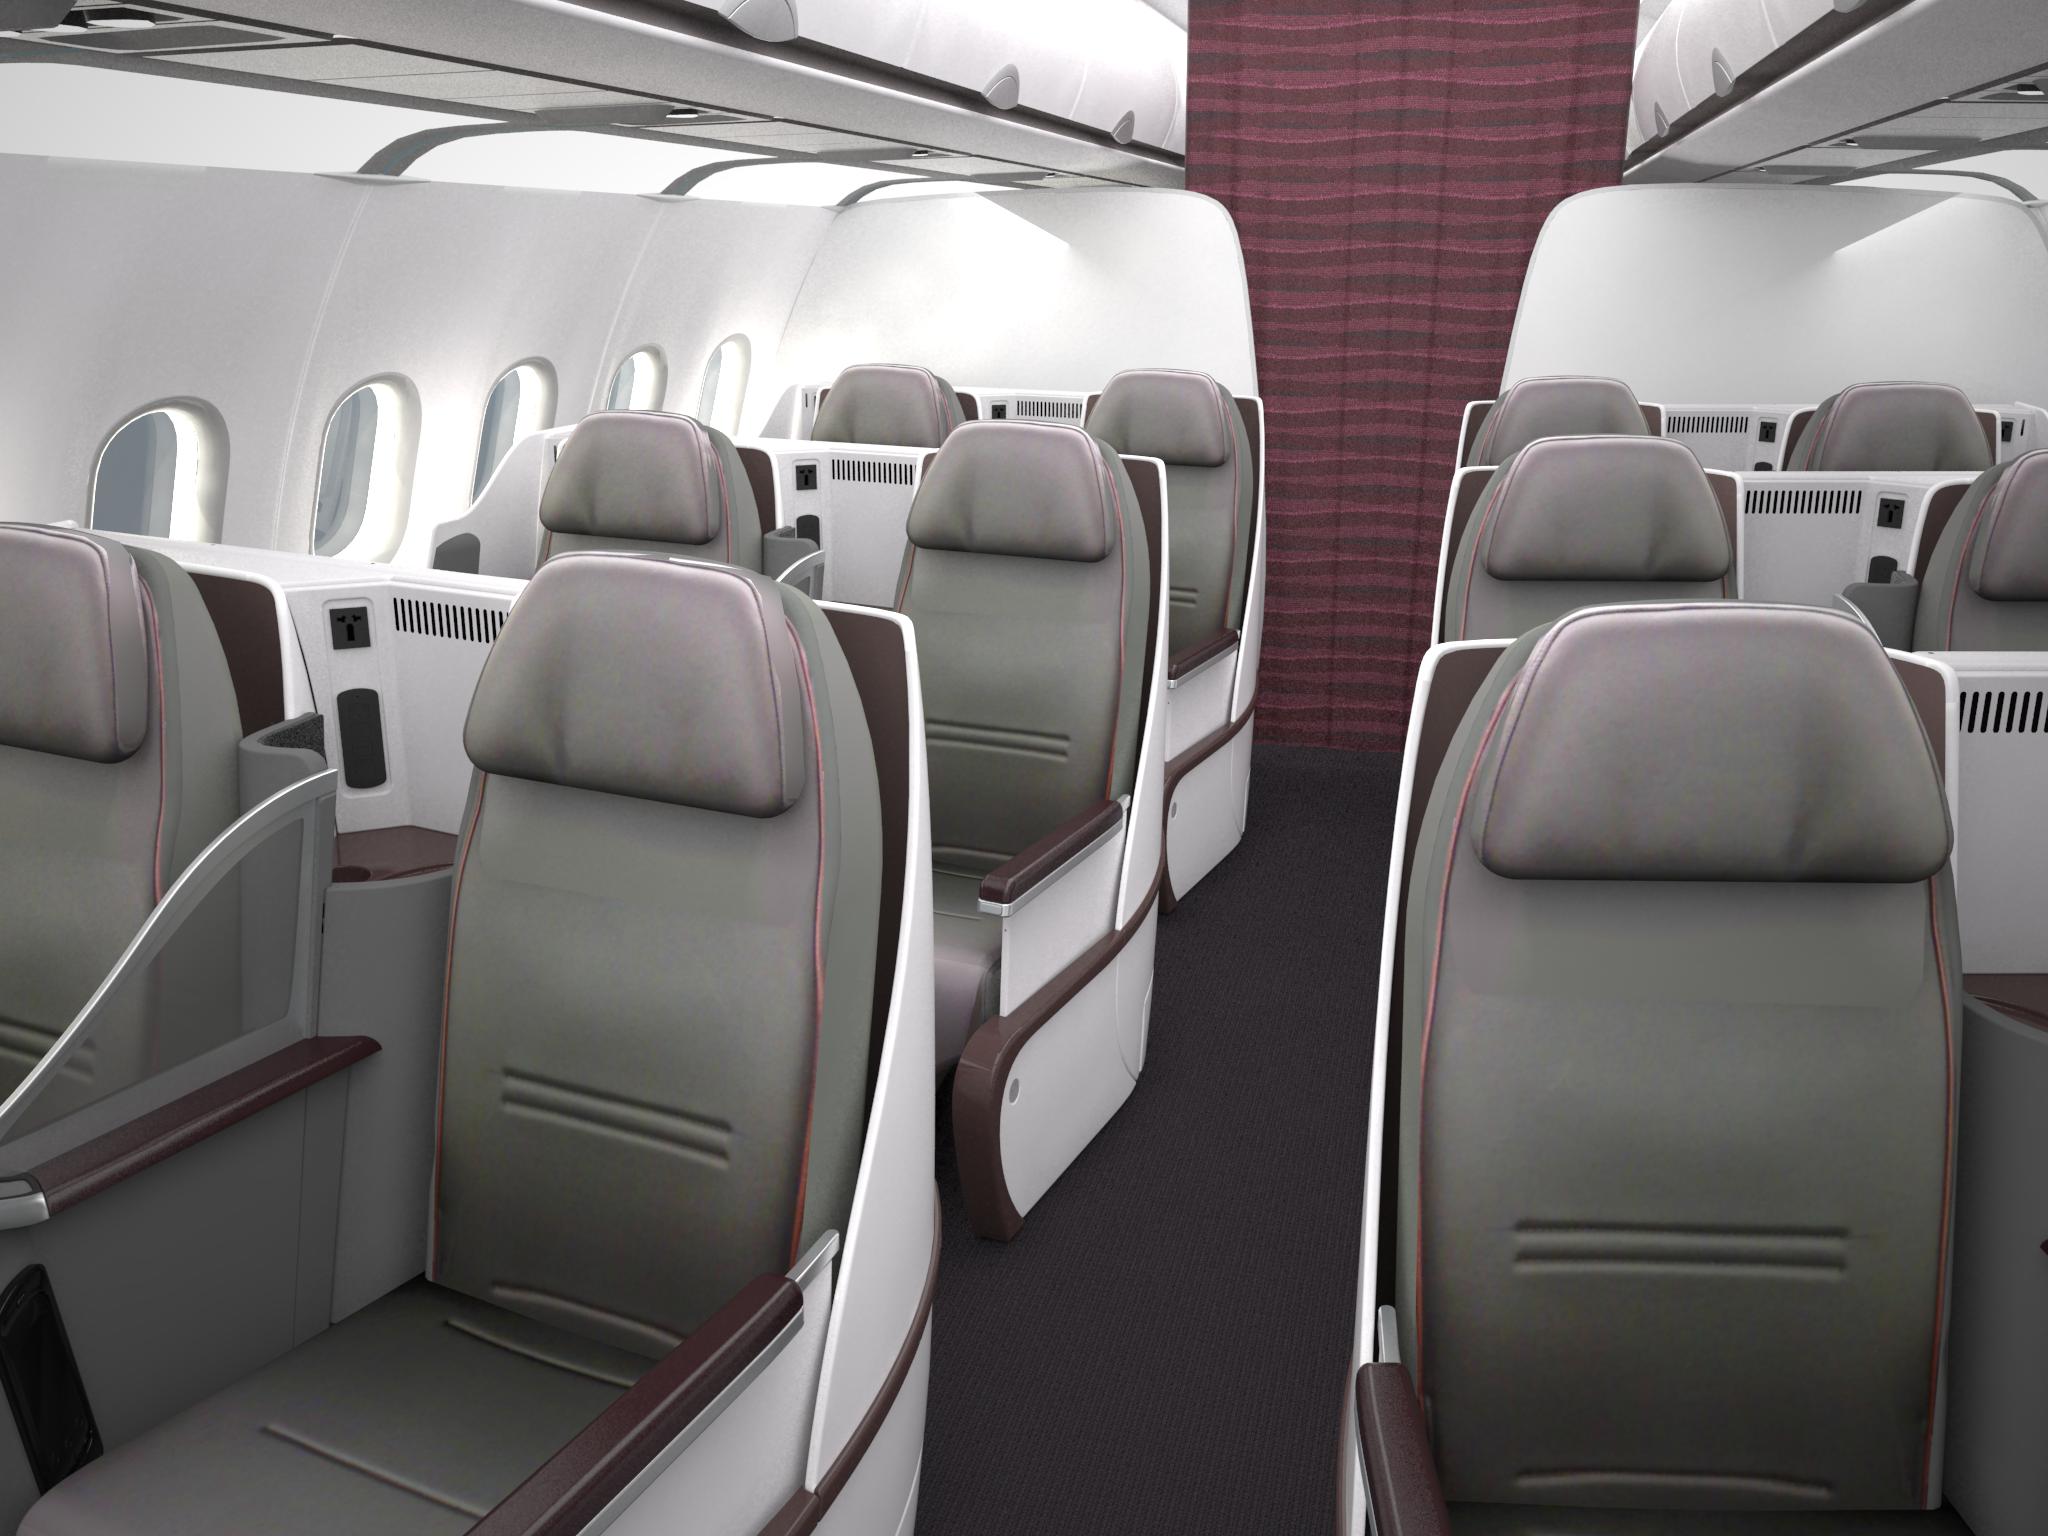 Qatar A320 Business Class Image: Qatar Airways